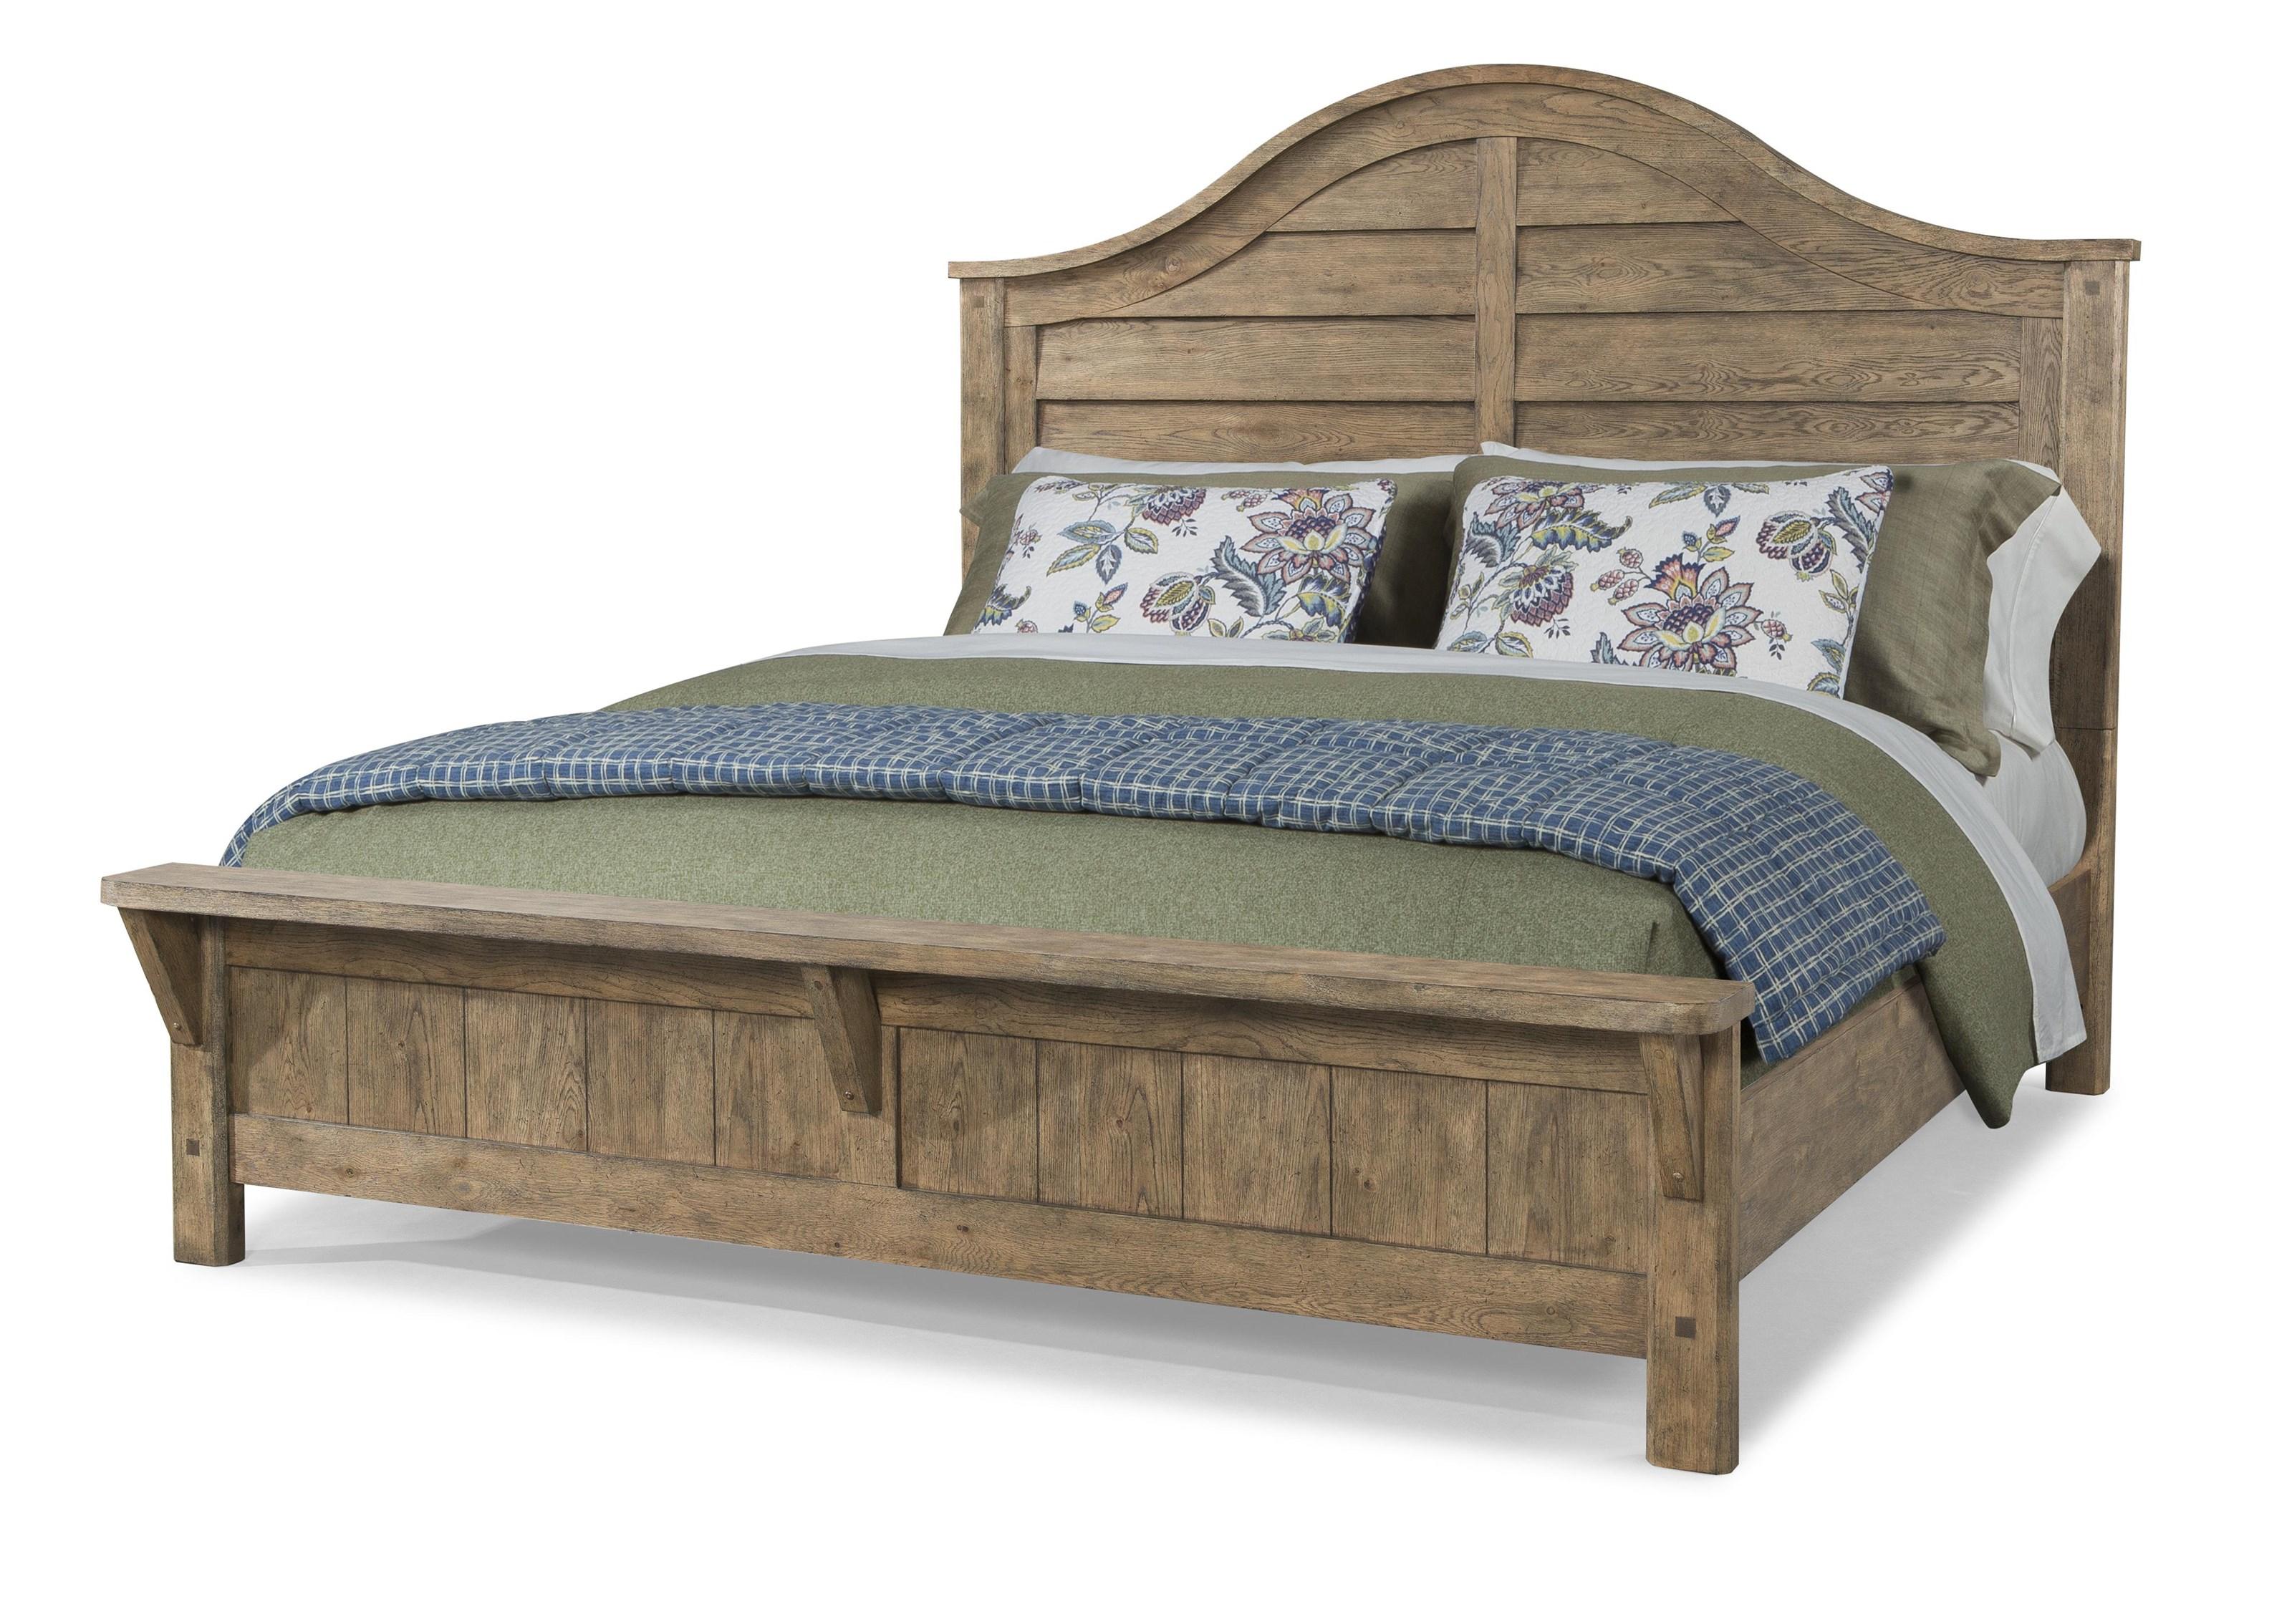 Morris Home River Falls River Falls King Bed - Item Number: 119686984